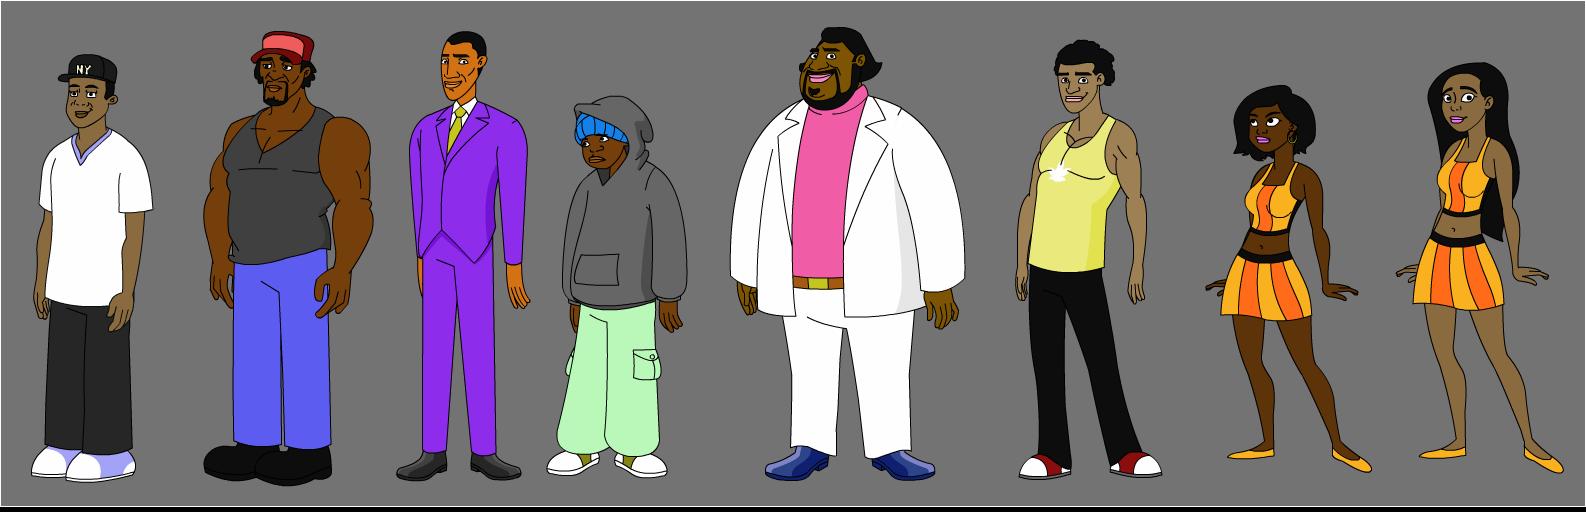 The Boros Character Models